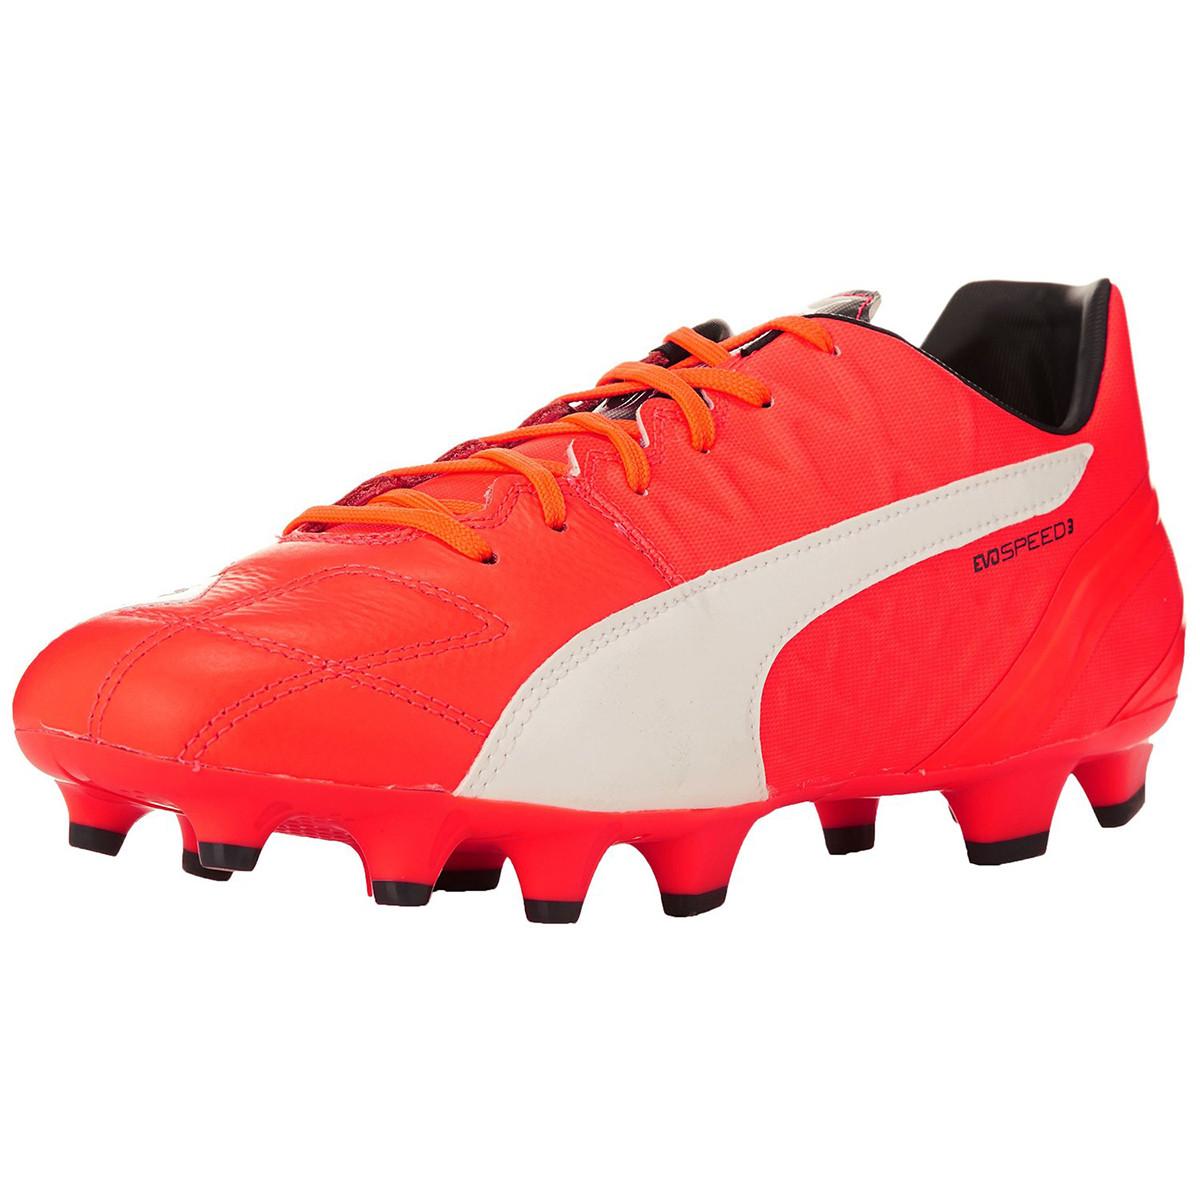 4 Football Pas Cher Chaussure Puma Homme Orange 3 Evospeed fgyIb6mvY7